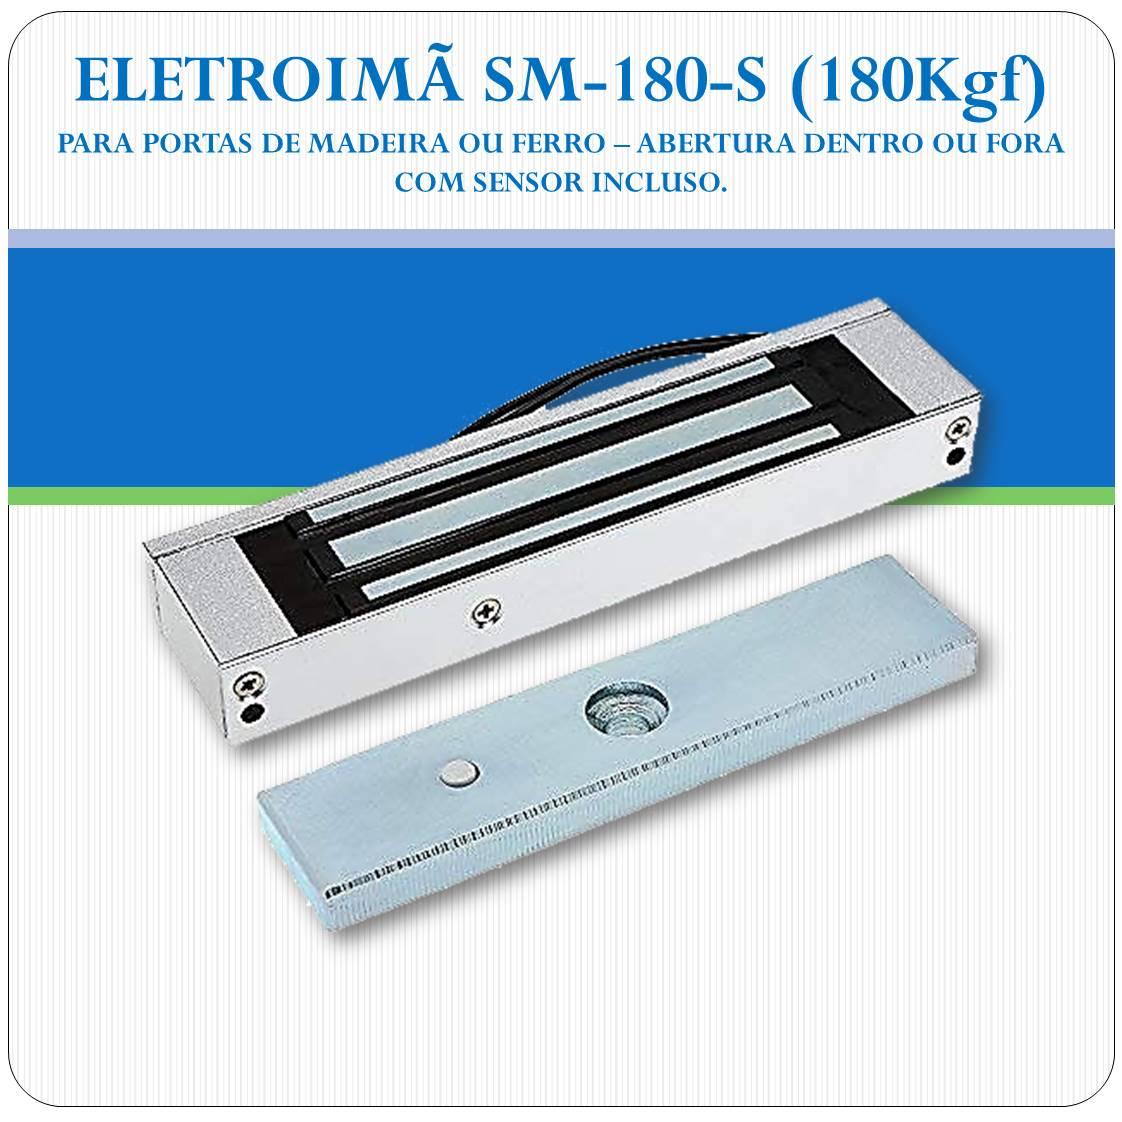 Eletroimã SM-180 - 180Kgf